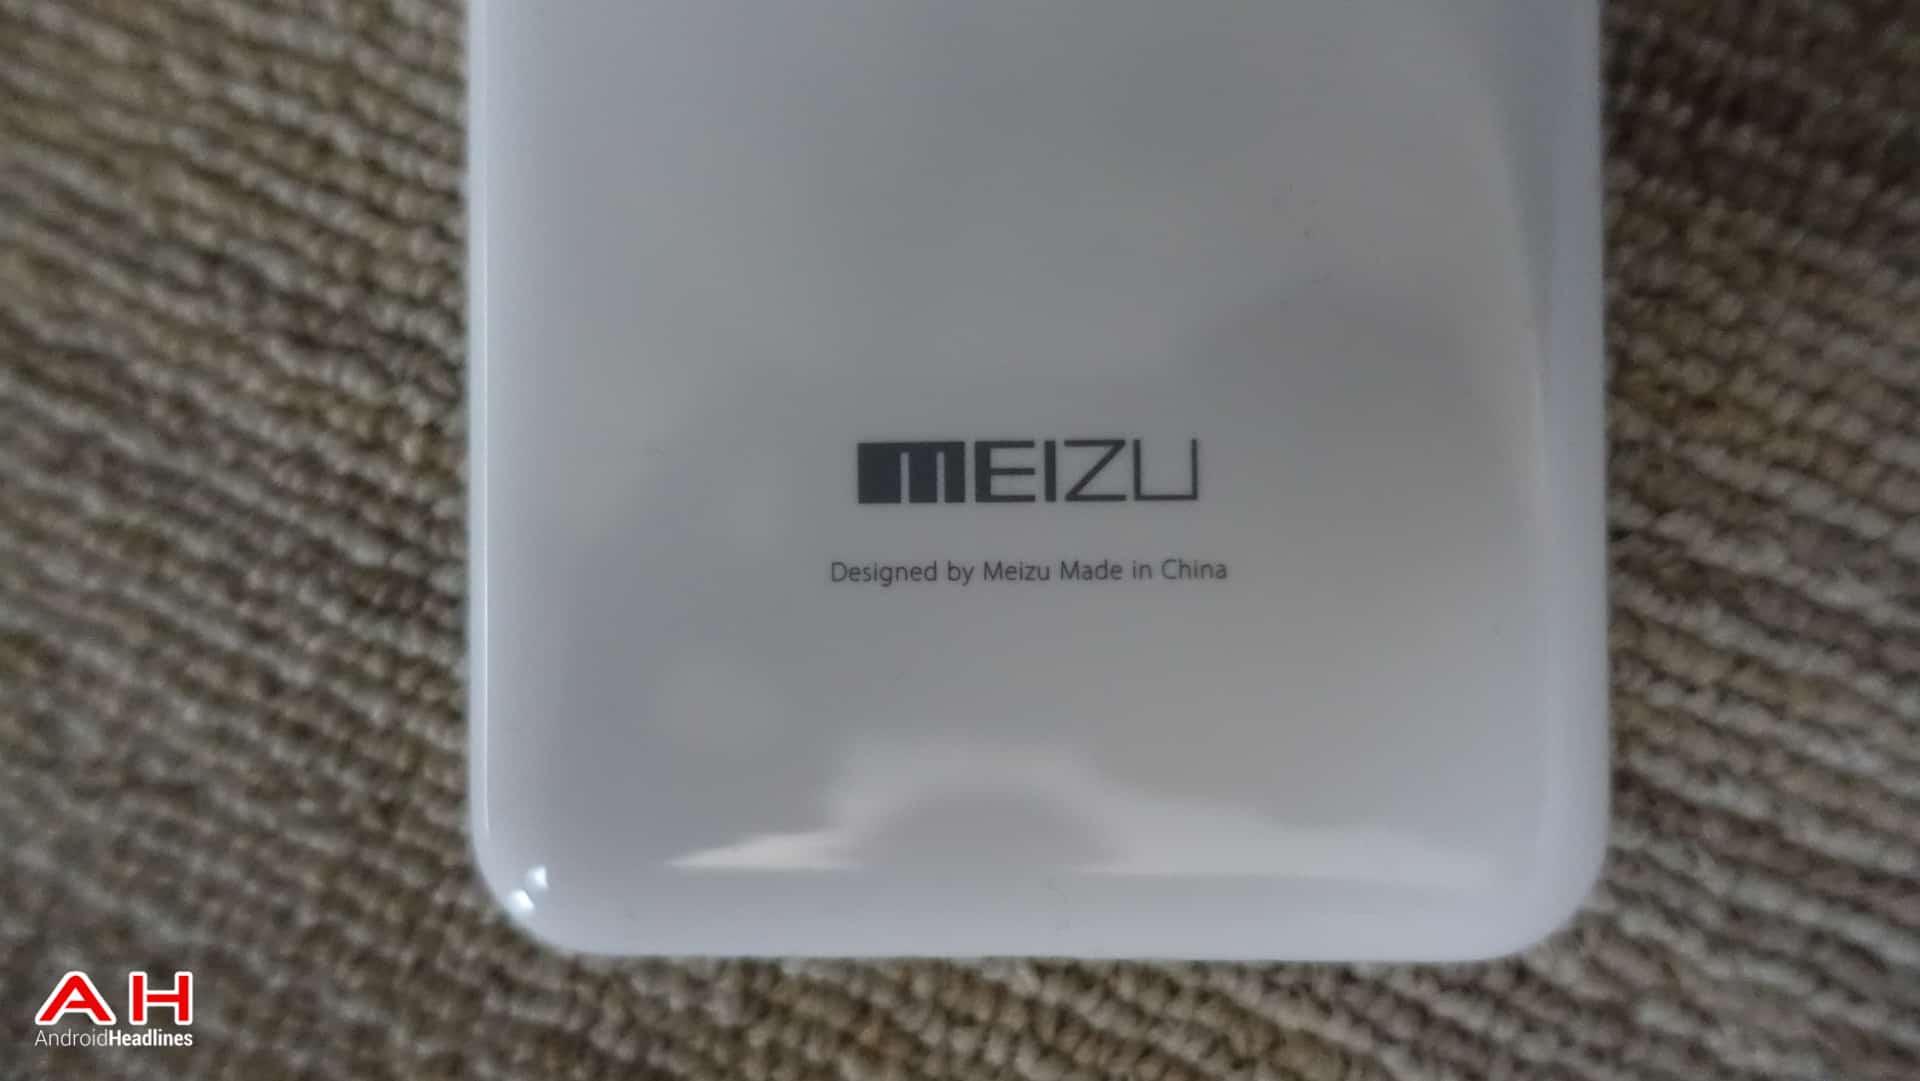 Meizu-M2-Note-Review-AH-8